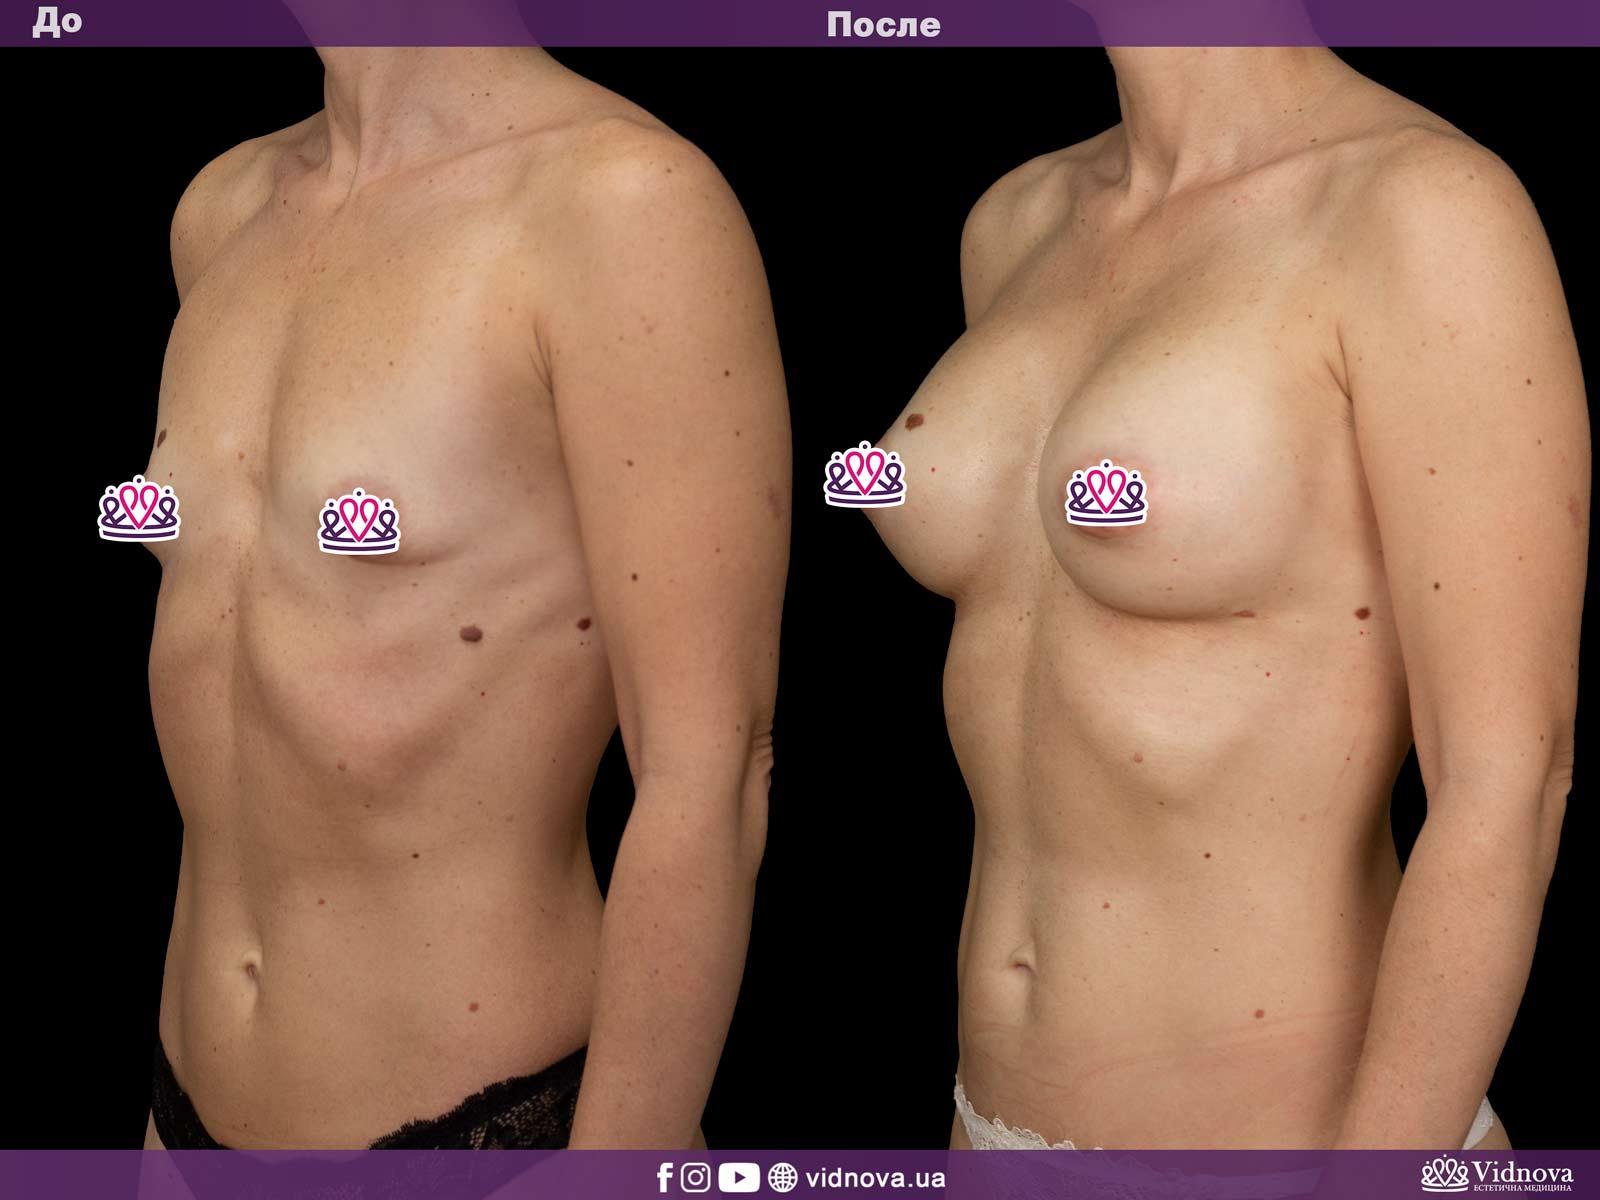 Увеличение груди: Фото ДО и ПОСЛЕ - Пример №26-2 - Клиника Vidnova